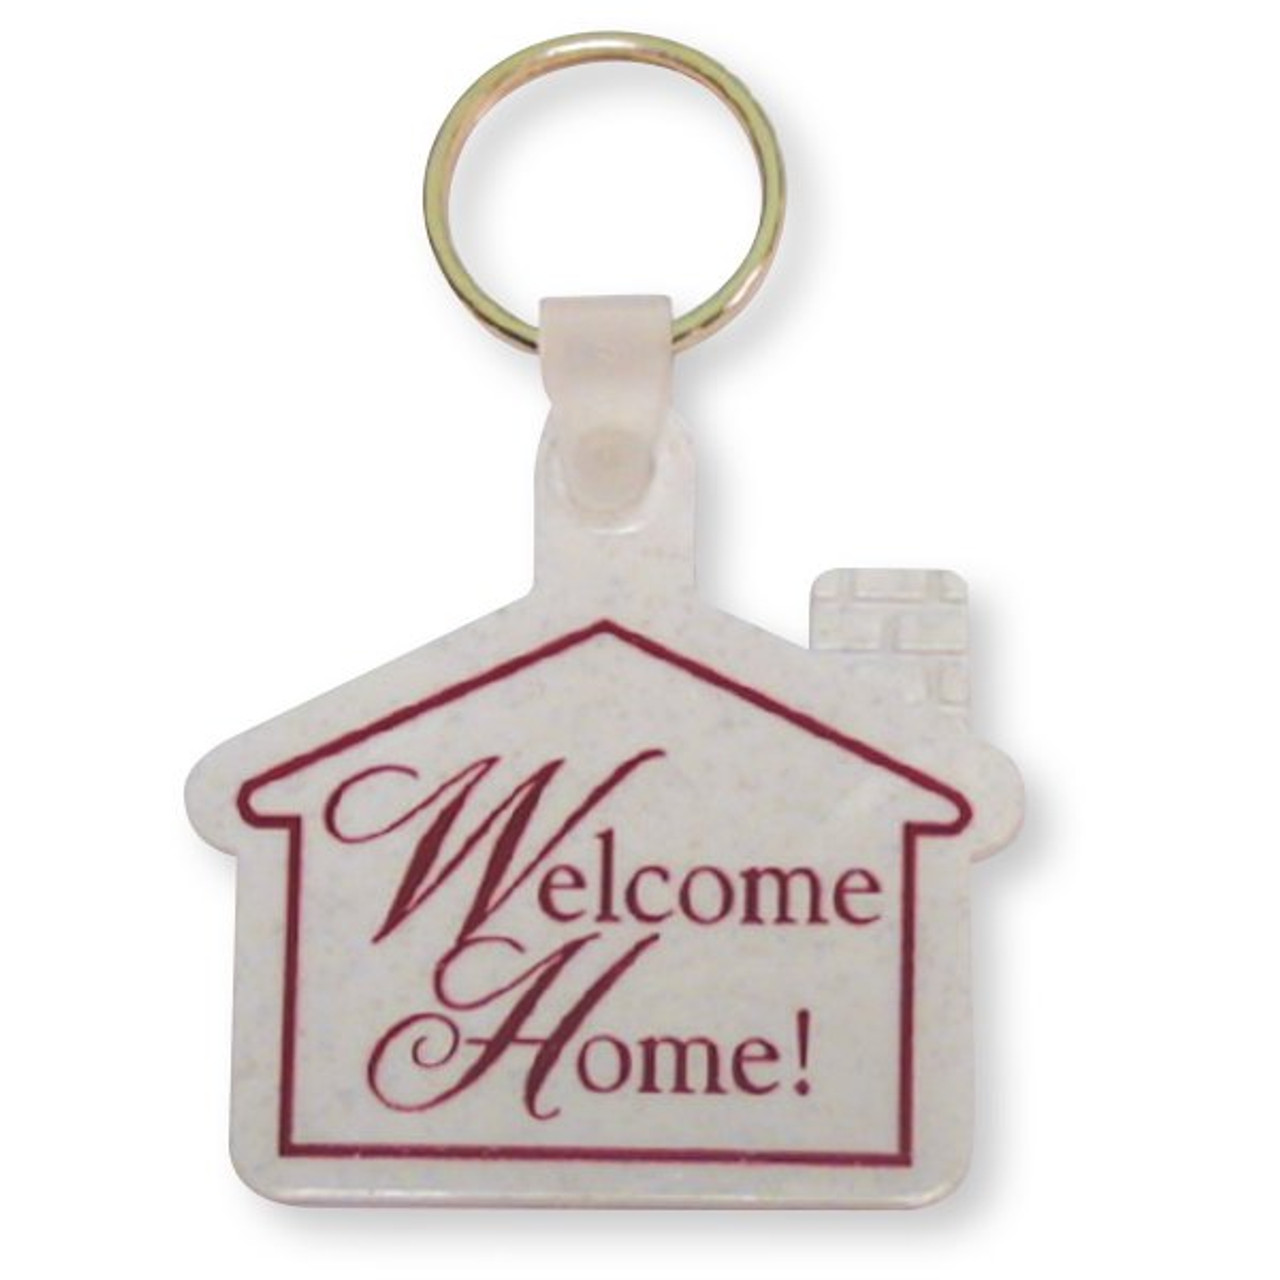 Welcome Home Key Tag Granite -Burgundy Imprint